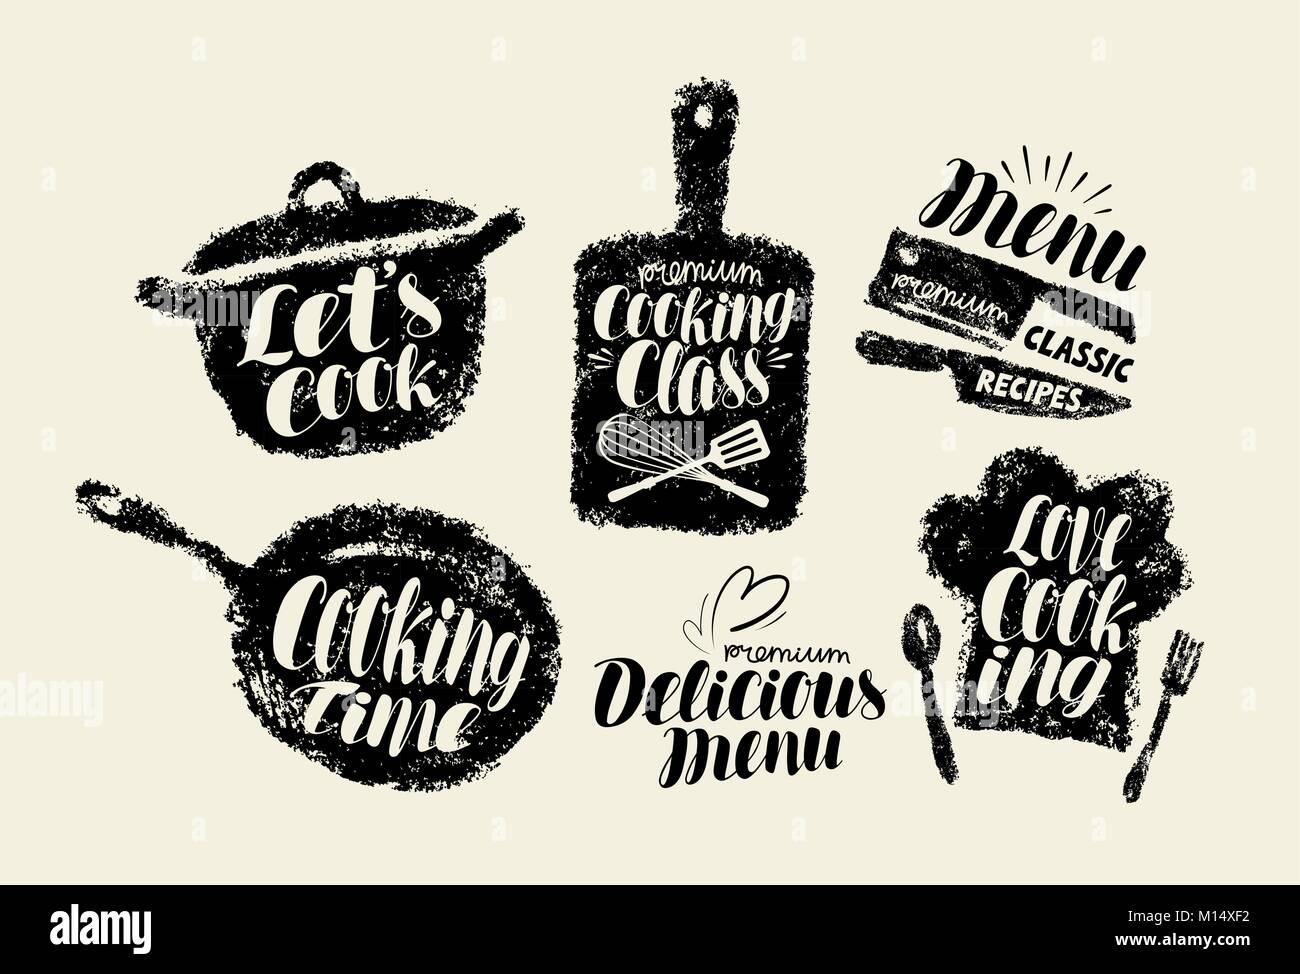 Cooking, cuisine label set. Cookery, kitchen utensils, kitchenware typography. Lettering vector illustration - Stock Vector